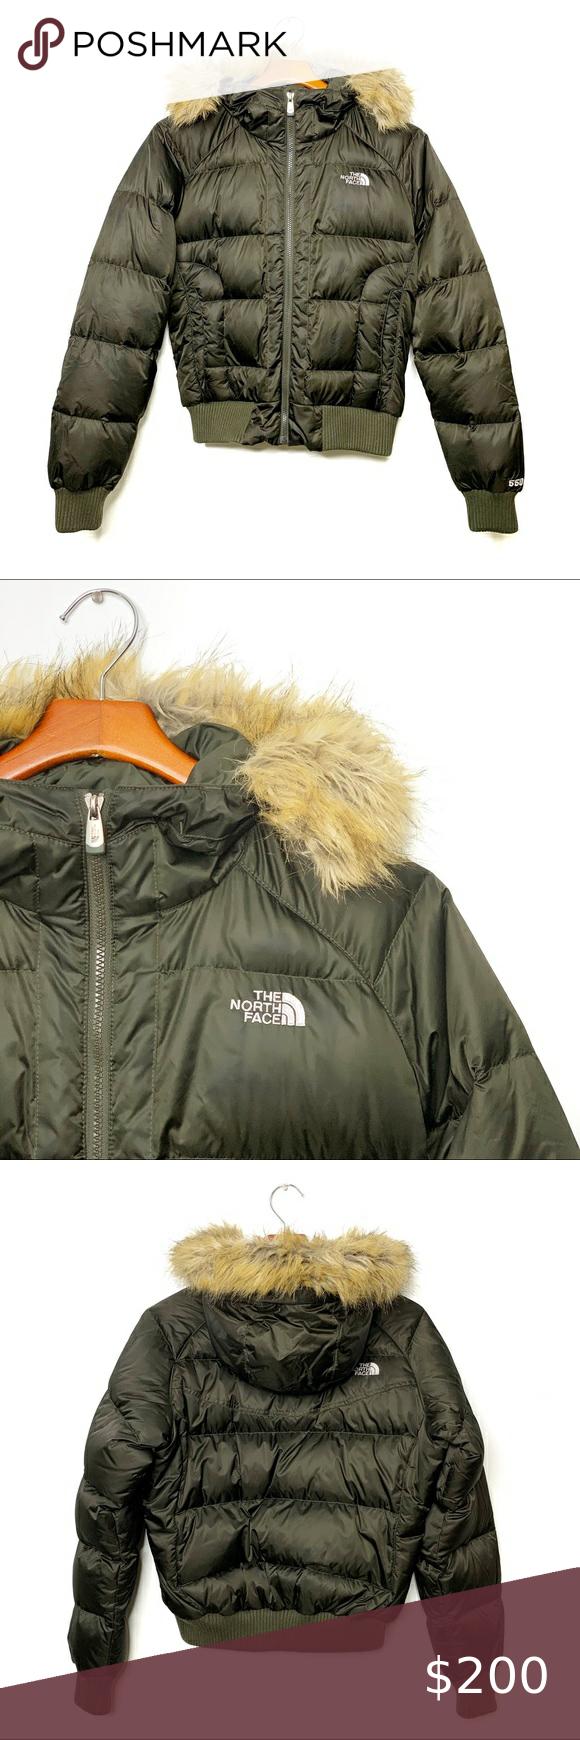 The North Face 550 Puffer Coat Fur Trim Hood Sz M Puffer Coat North Face Puffer Jacket North Face Puffy Jacket [ 1740 x 580 Pixel ]